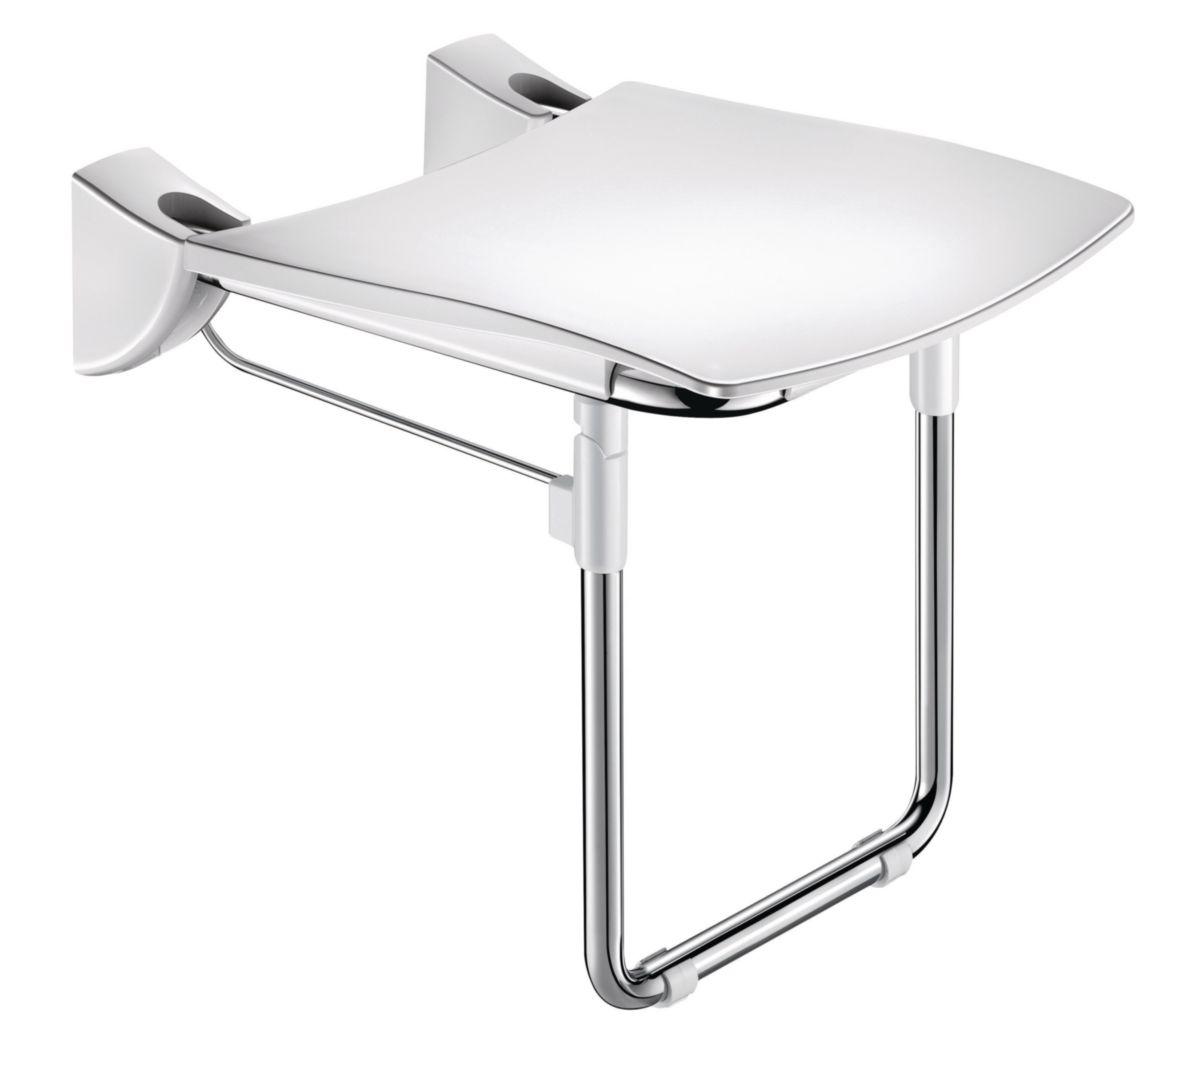 Siège de douche inox relevable avec pied, assise grand confort nylon HR inox poli brillant réf. 510430